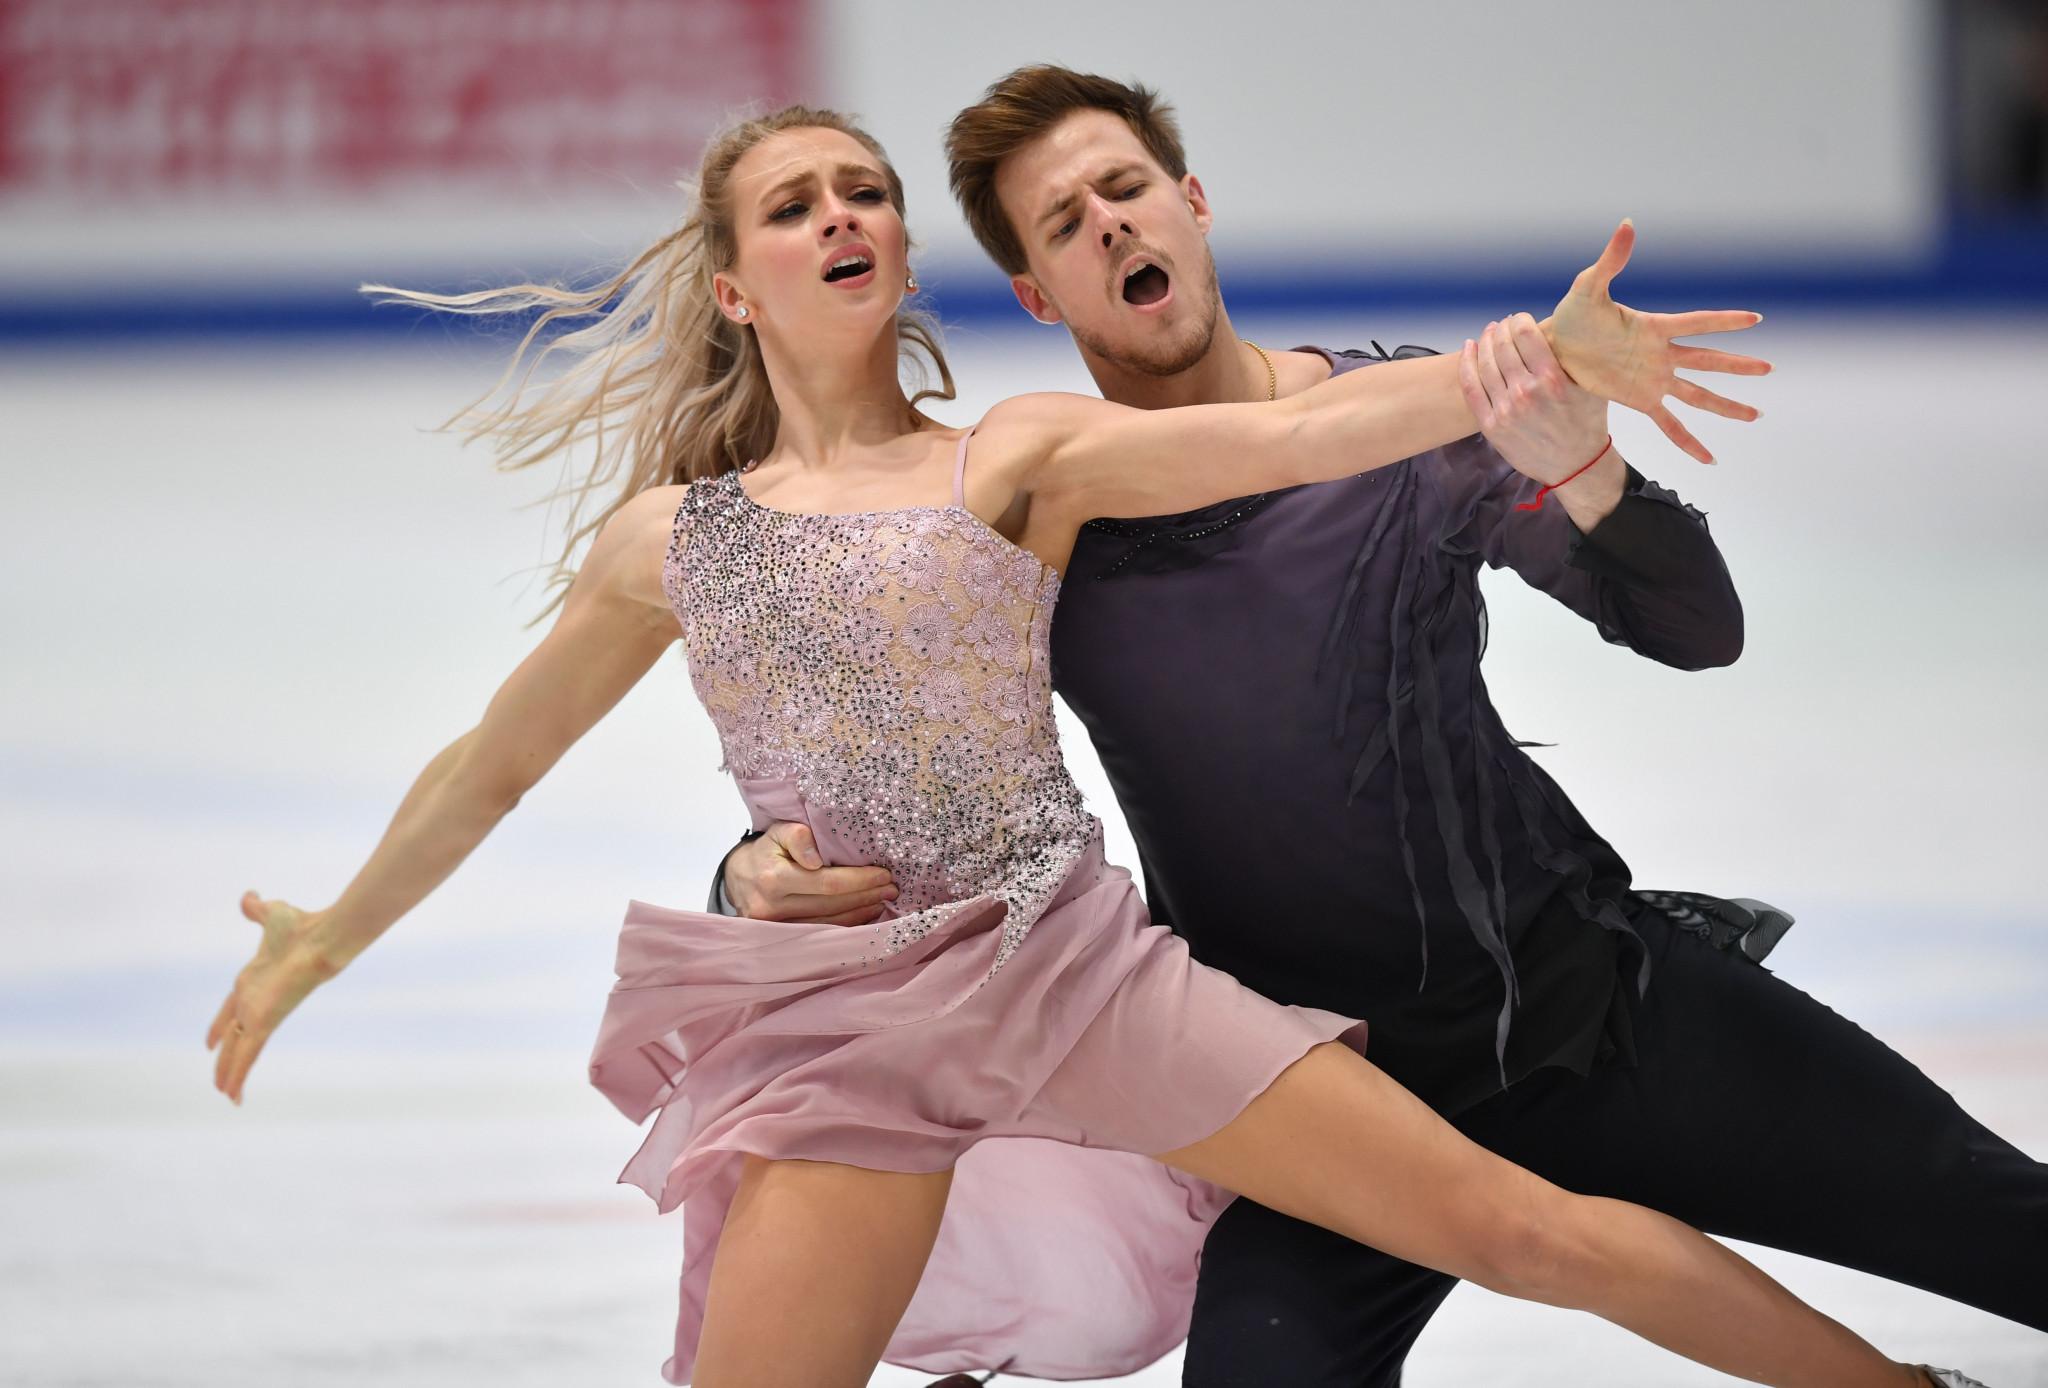 Russia's Victoria Sinitsina and Nikita Katsalapov skated brilliantly to deny France's Gabriella Papadakis and Guillaume Cizeron a record-equalling sixth European Championship ice dance title ©Getty Images